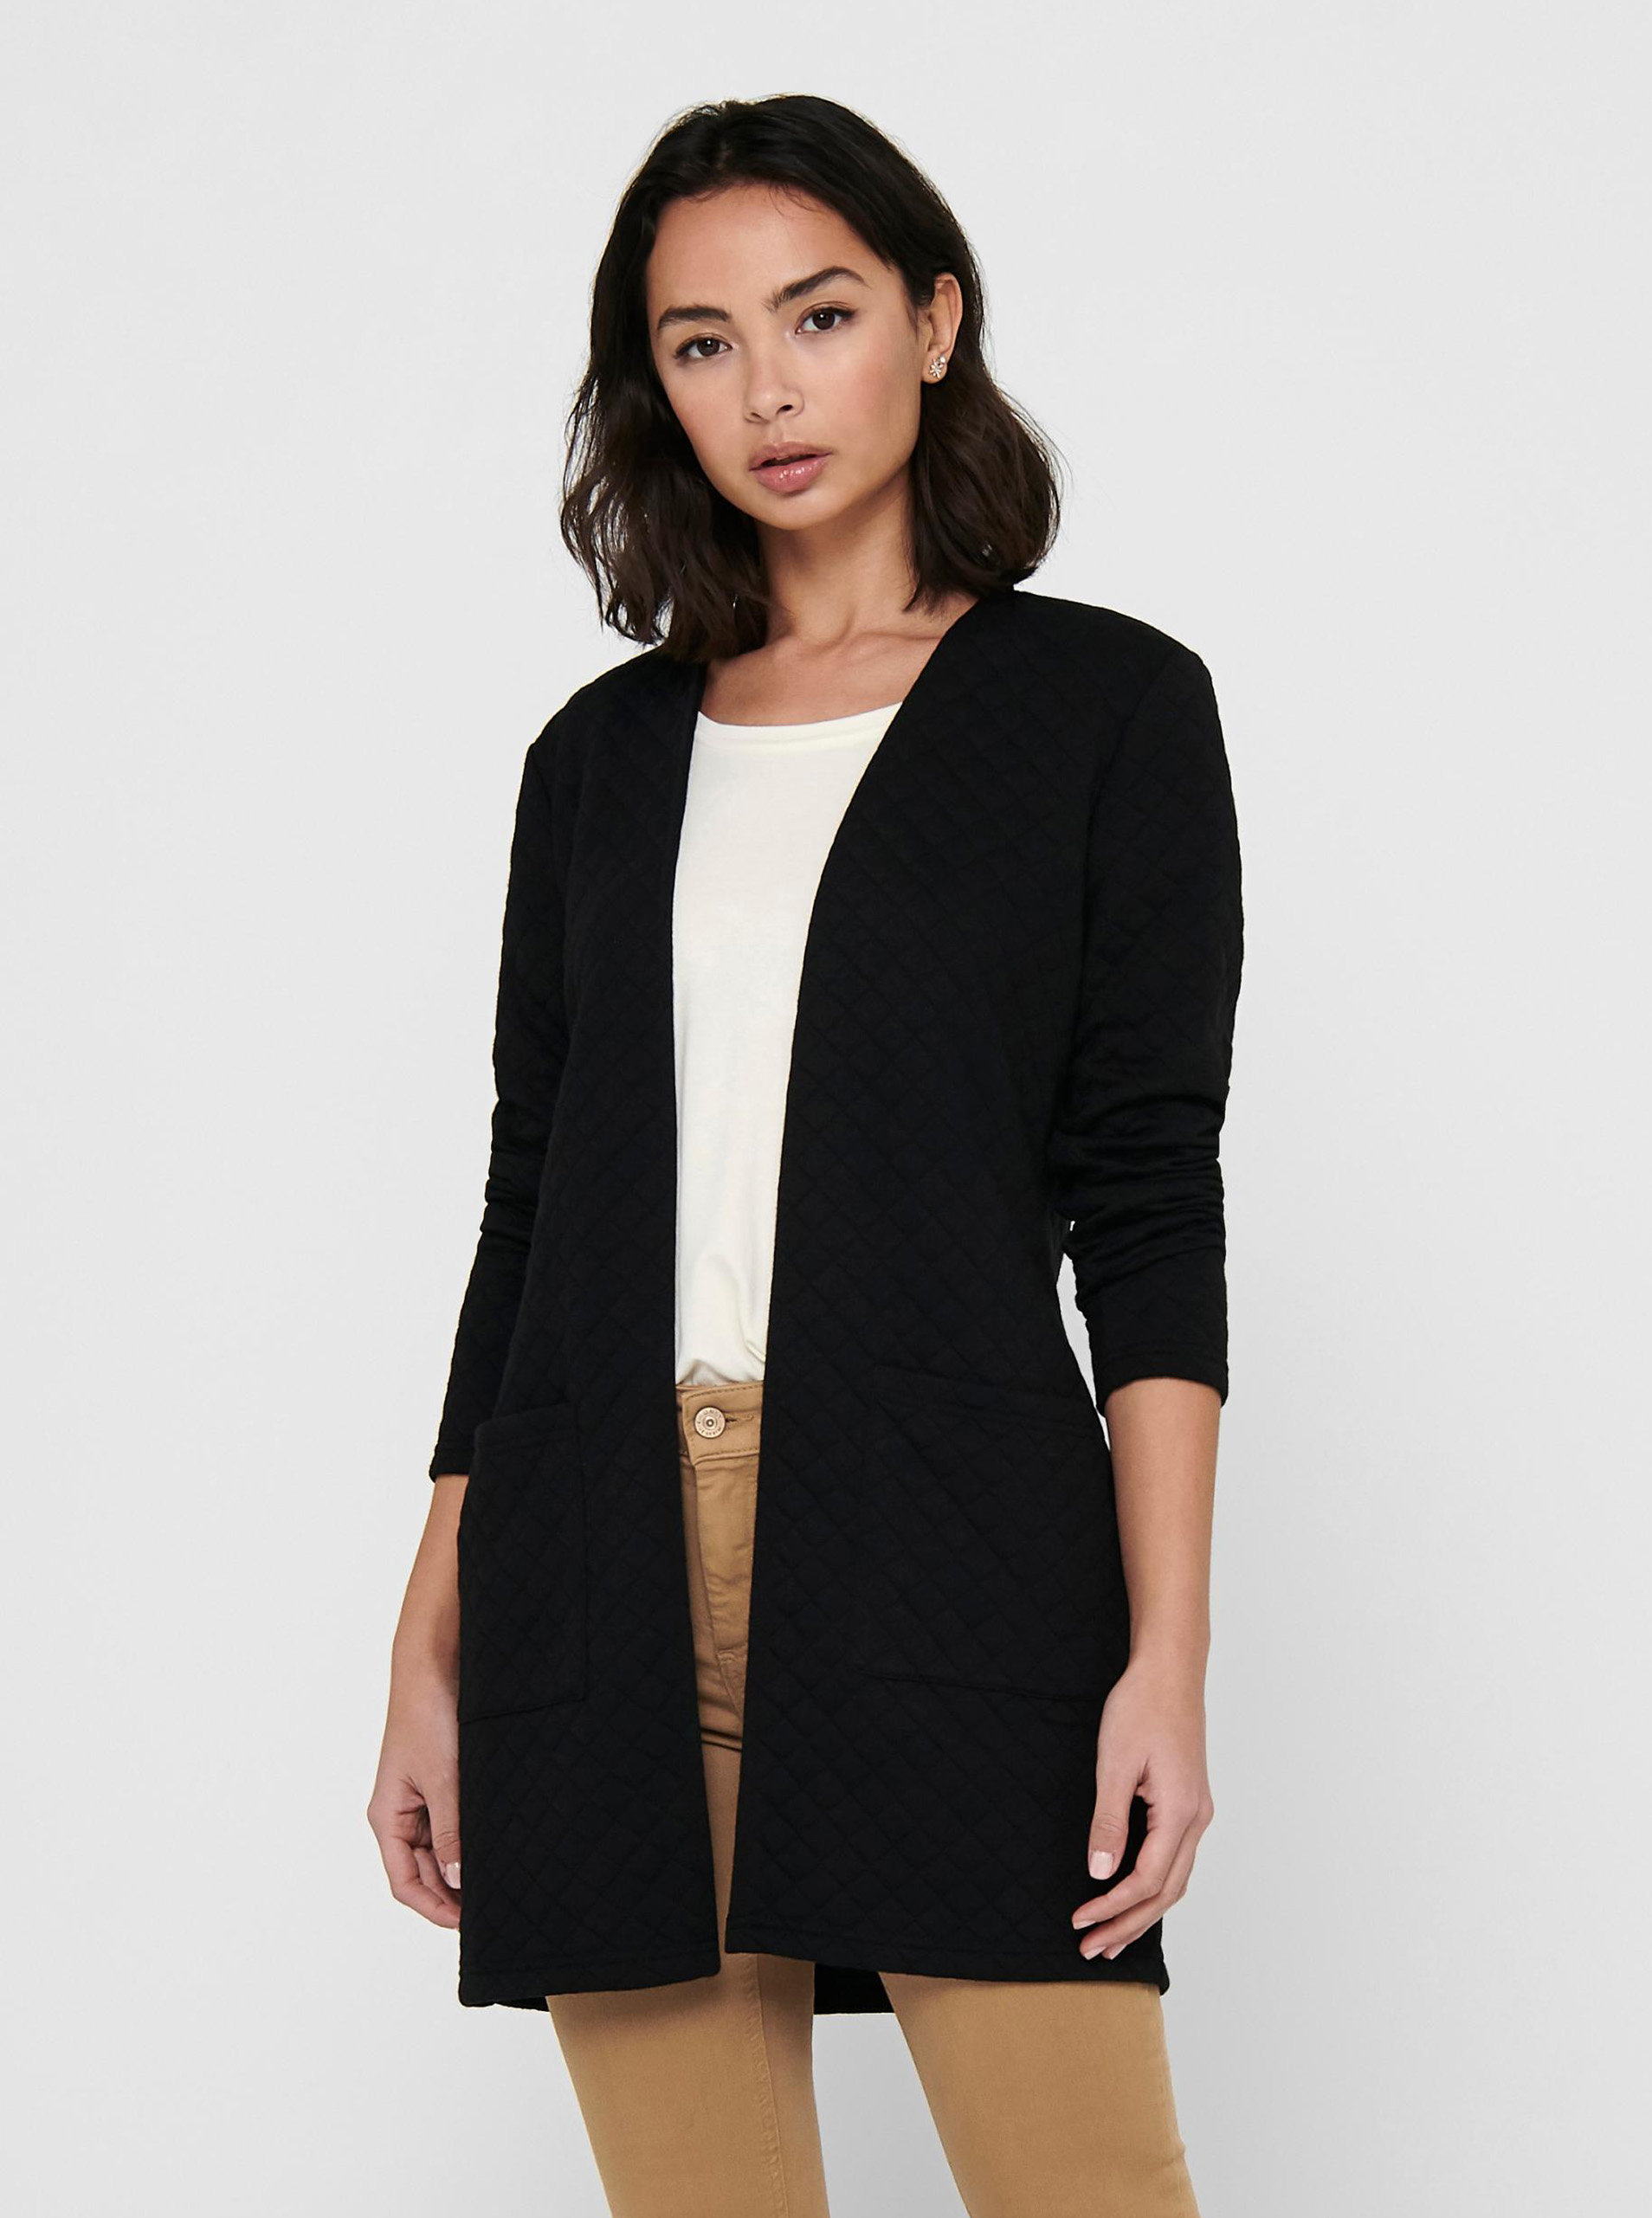 Černý lehký kabát Jacqueline de Yong Napa